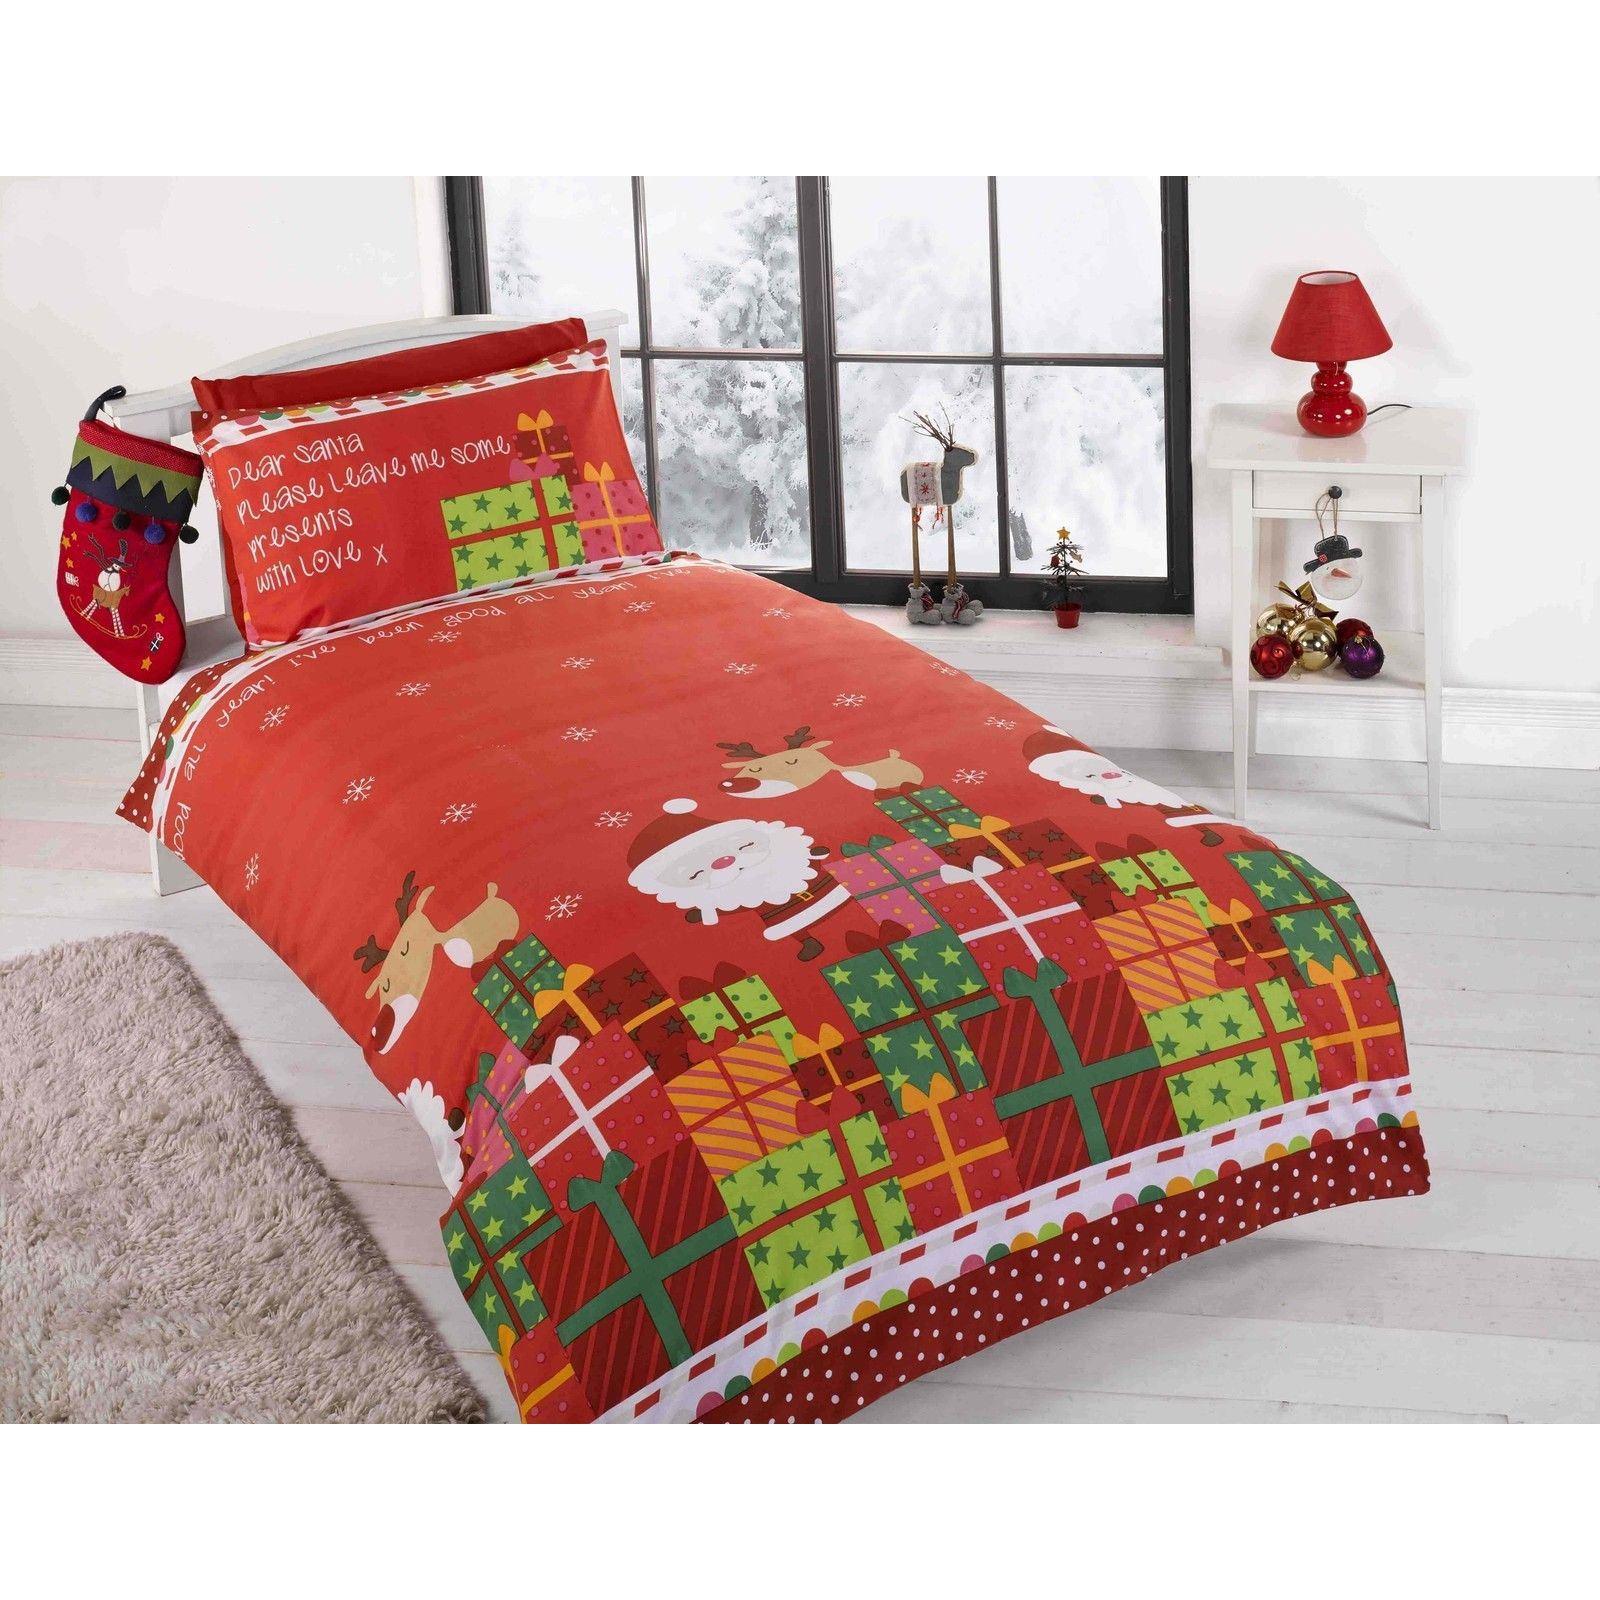 Christmas Duvet Cover Sets Various Styles Snowman Santa Kids Bedding Boys Girls